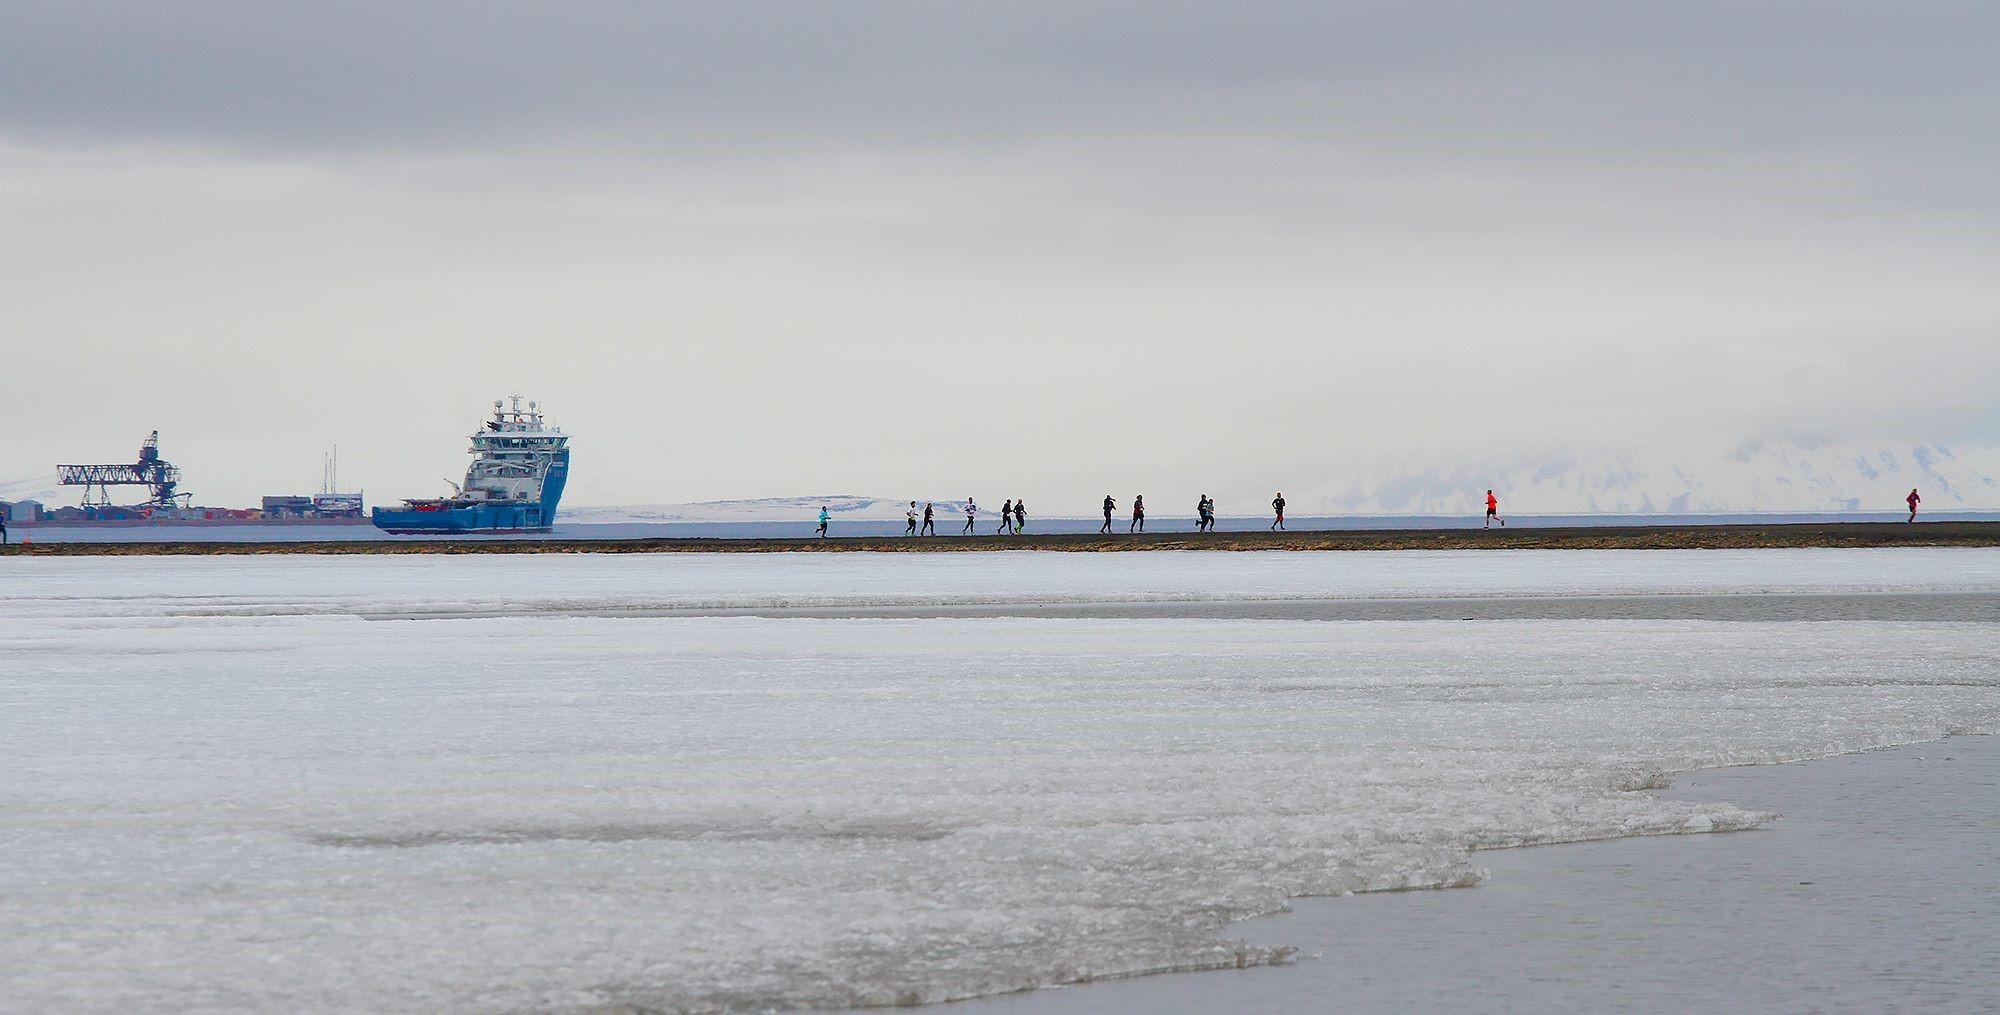 Løpere_på_Svalbard.jpg